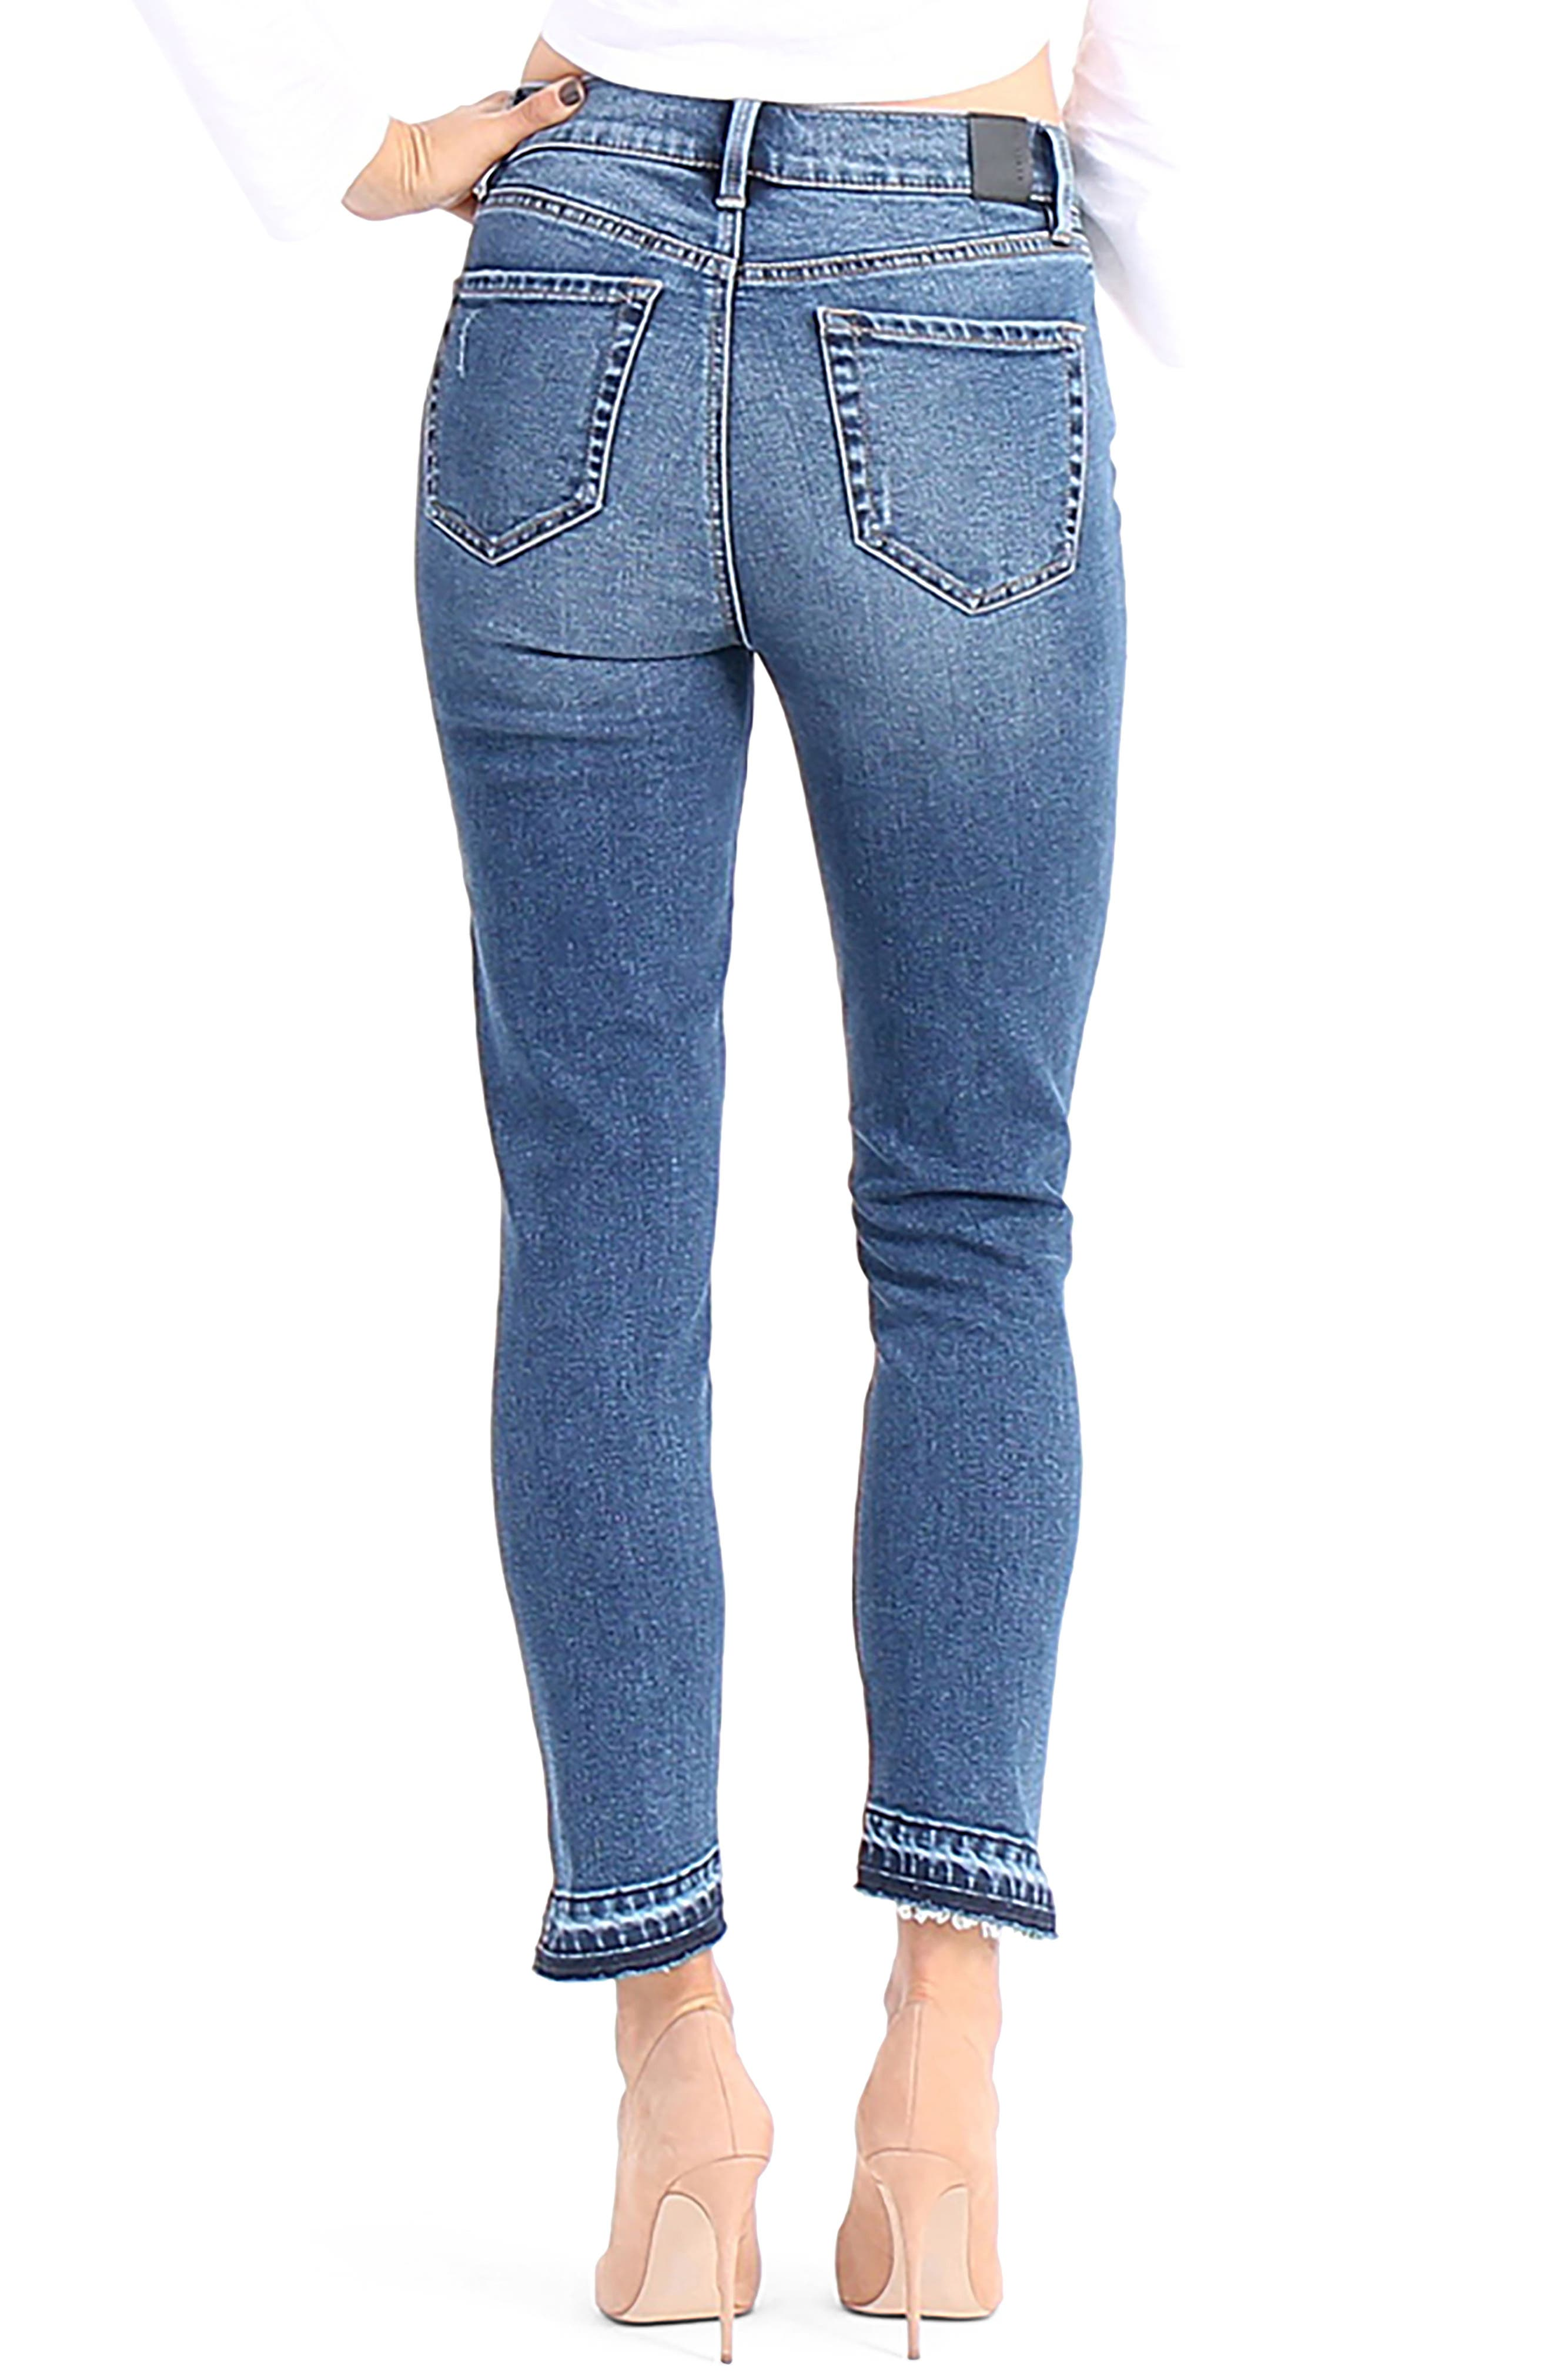 Elle Uneven Hem Skinny Jeans,                             Alternate thumbnail 2, color,                             After Glow